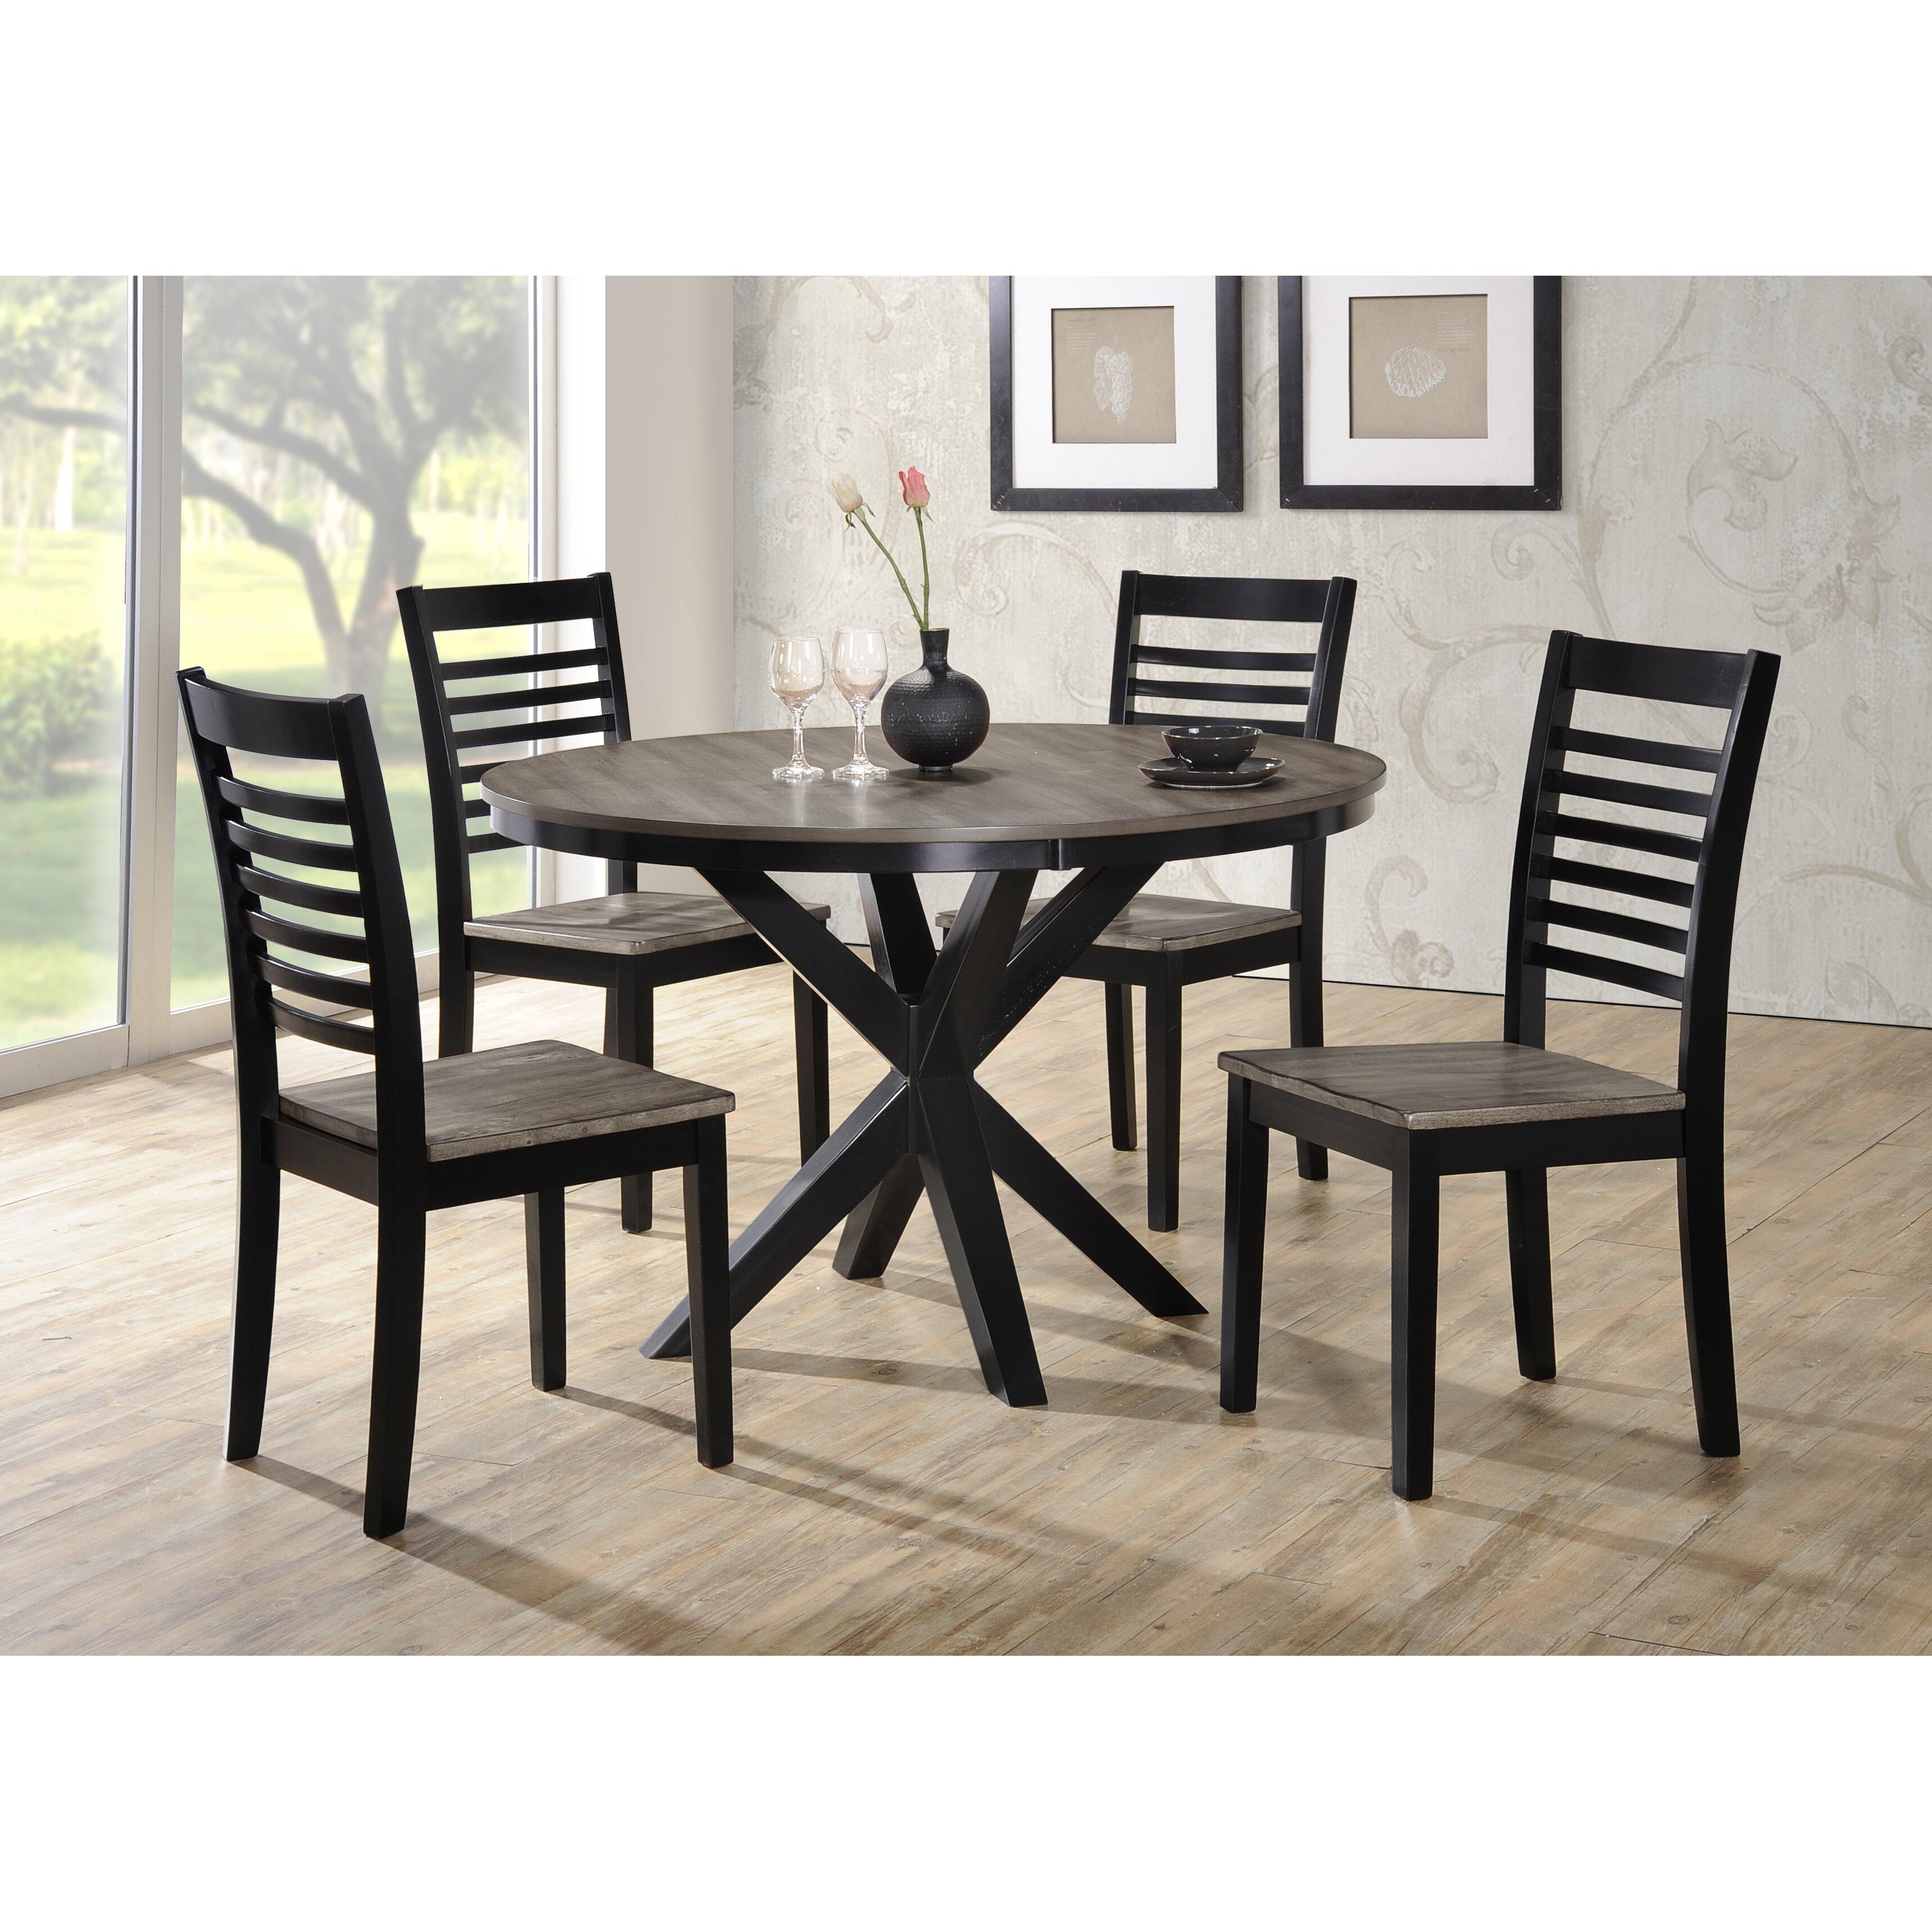 Charming ... Chair · Red Barrel Studio Reg Clipper City 5 Piece Dining Set ...